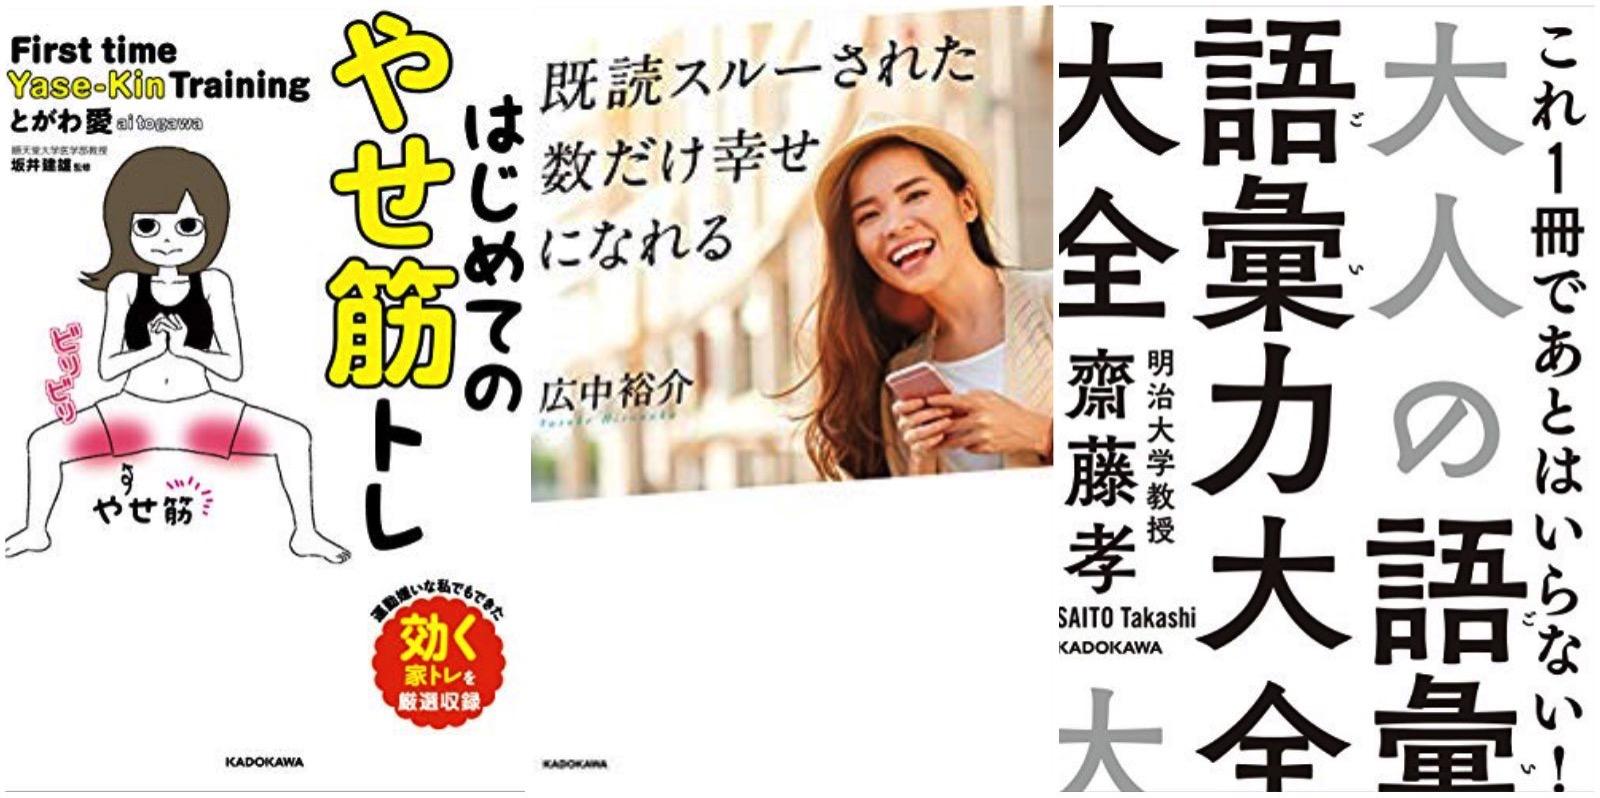 Nikoniko Kadokawa sale 2019